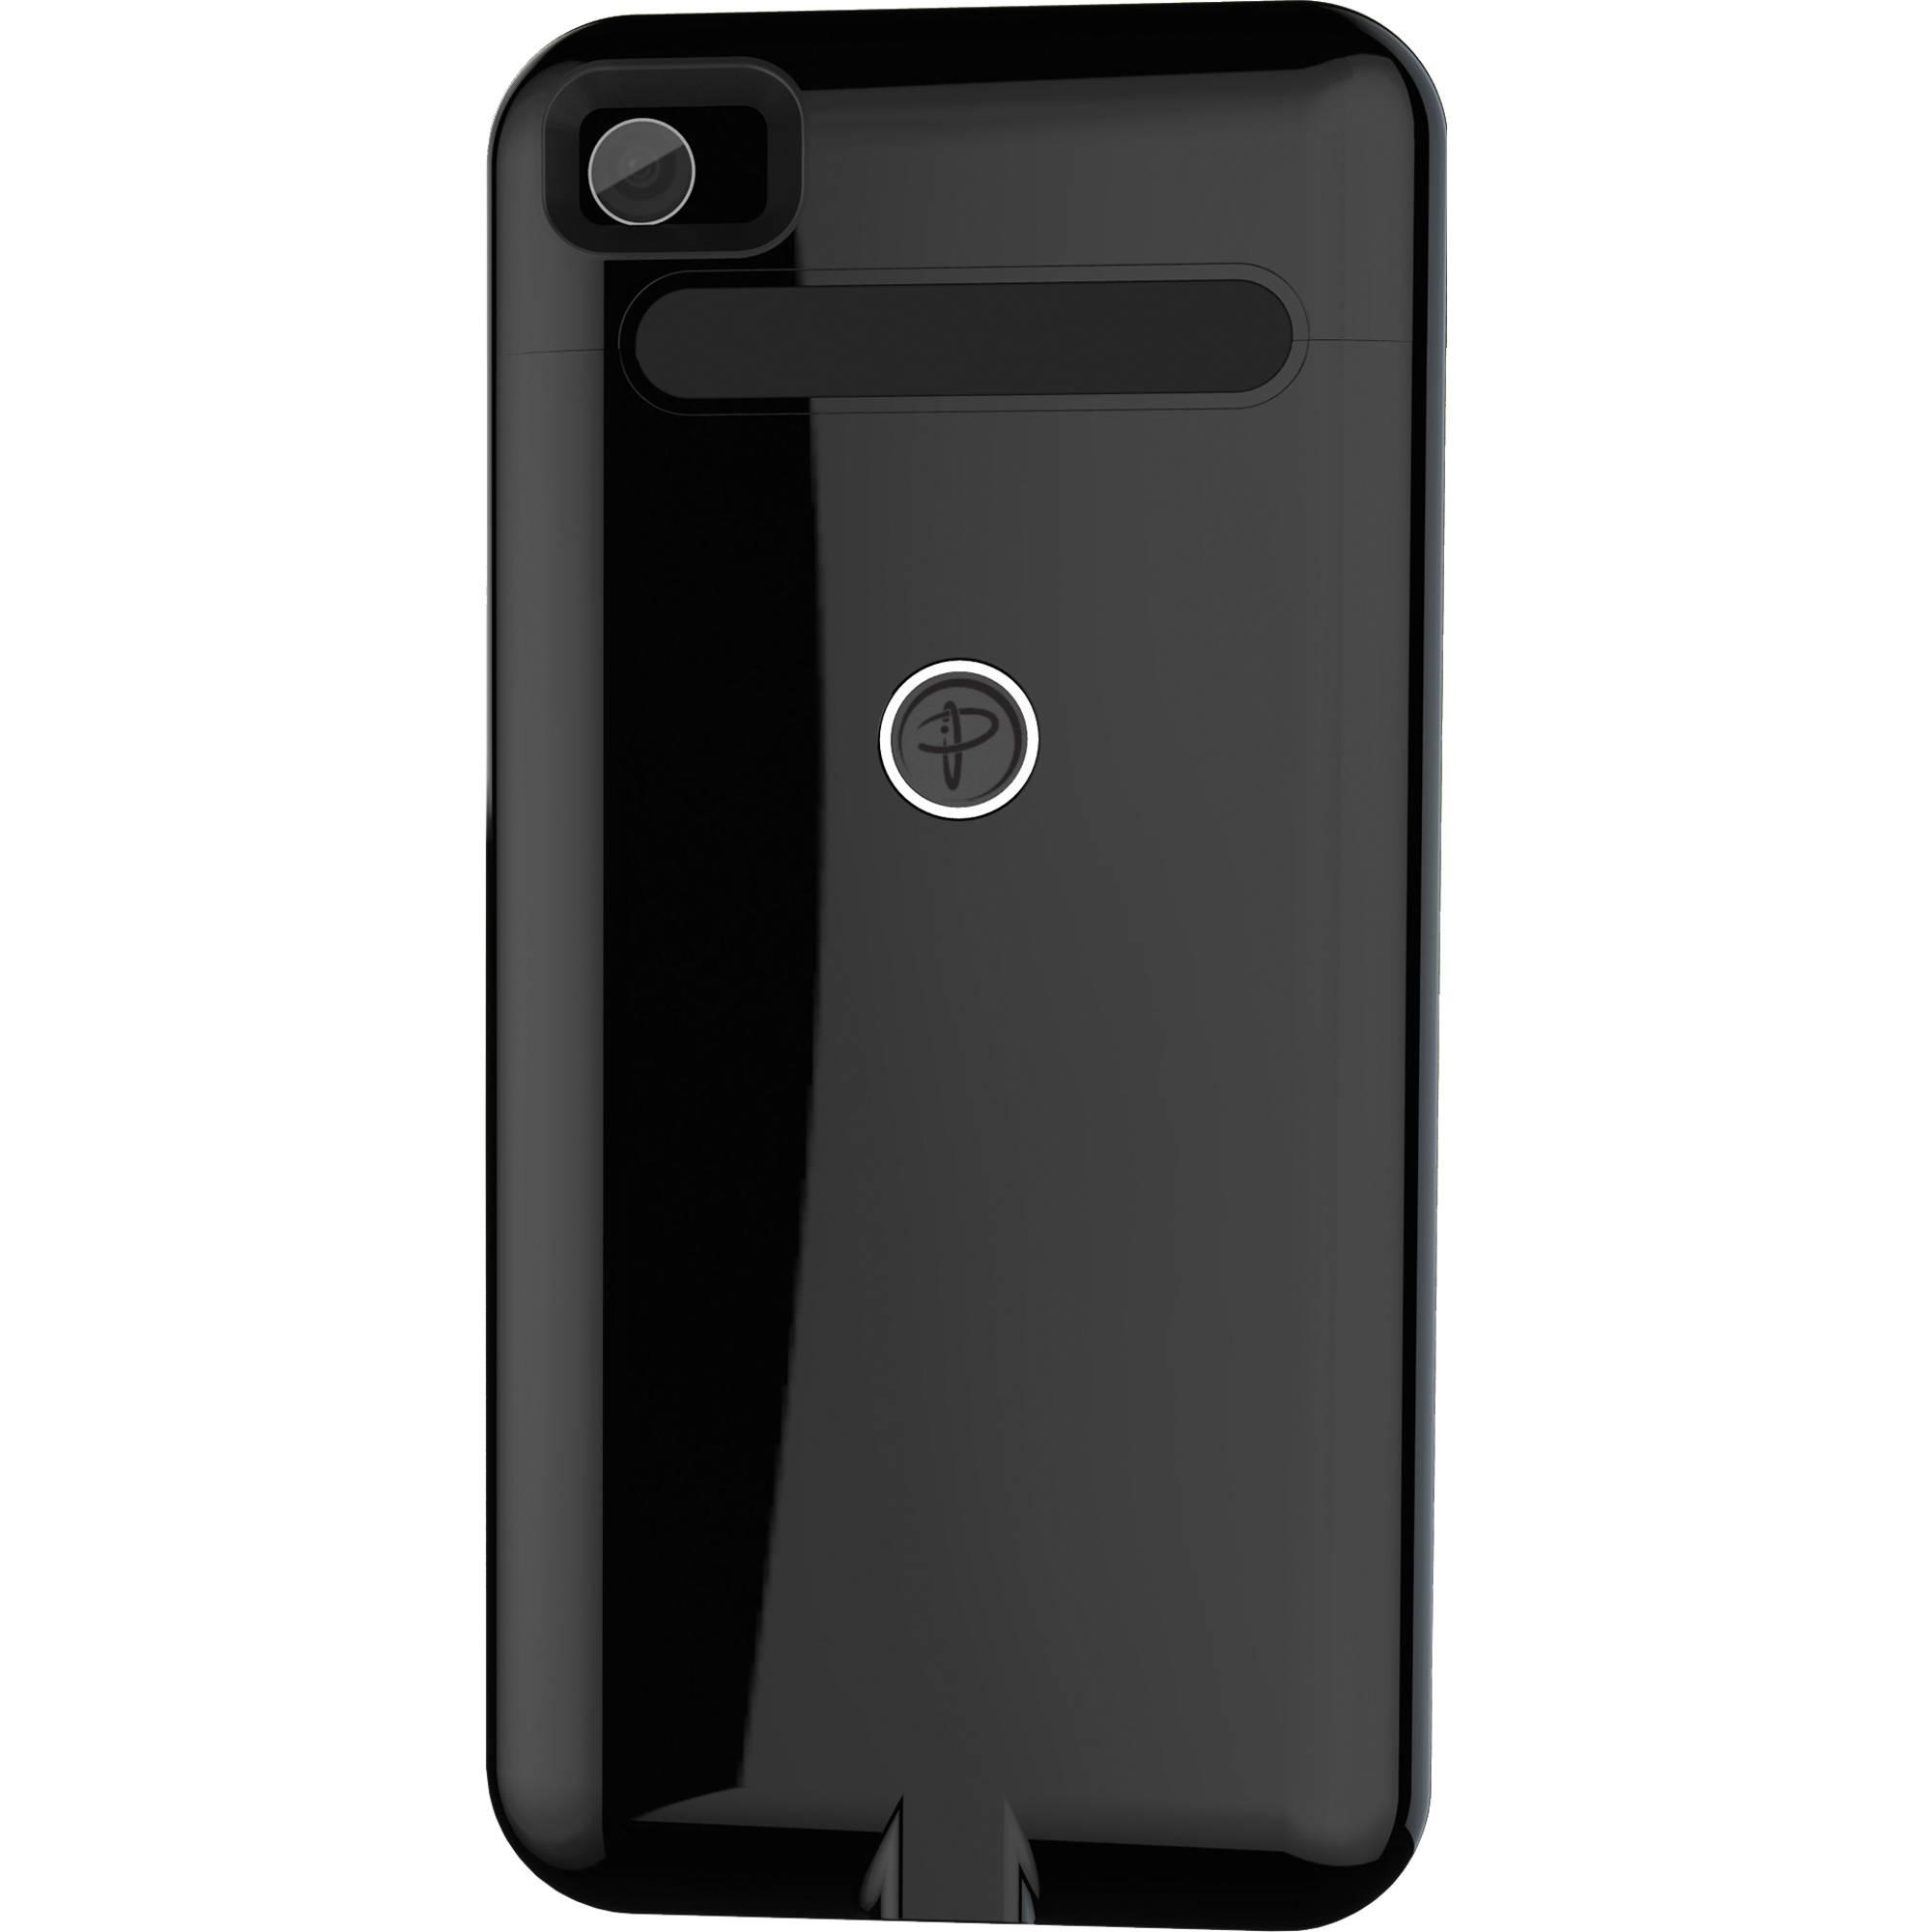 sale retailer fd81a 4e5a8 Duracell Powermat Wireless Case for iPhone 4/4S (Black)